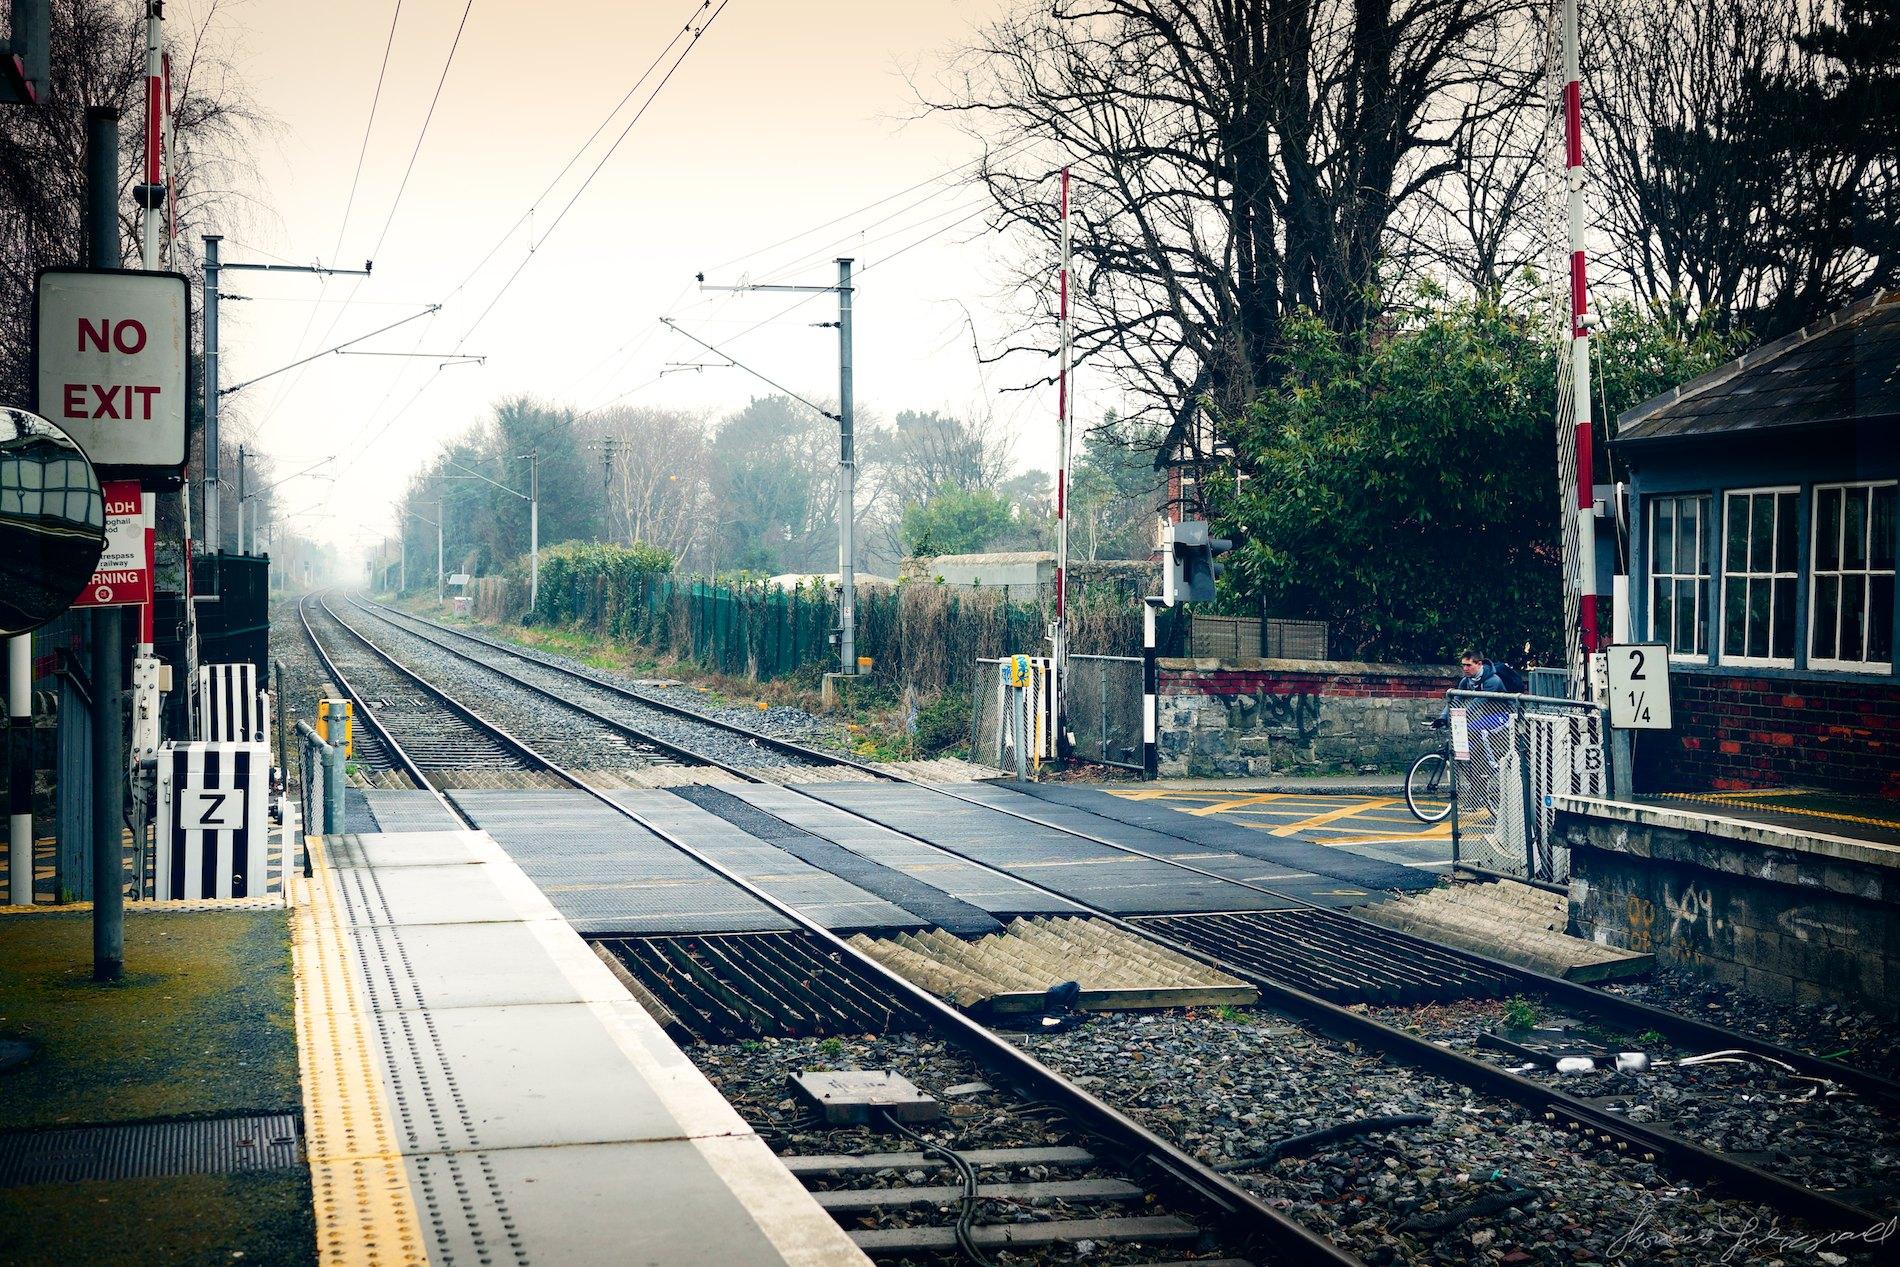 Foggy Train tracks with Nex-7